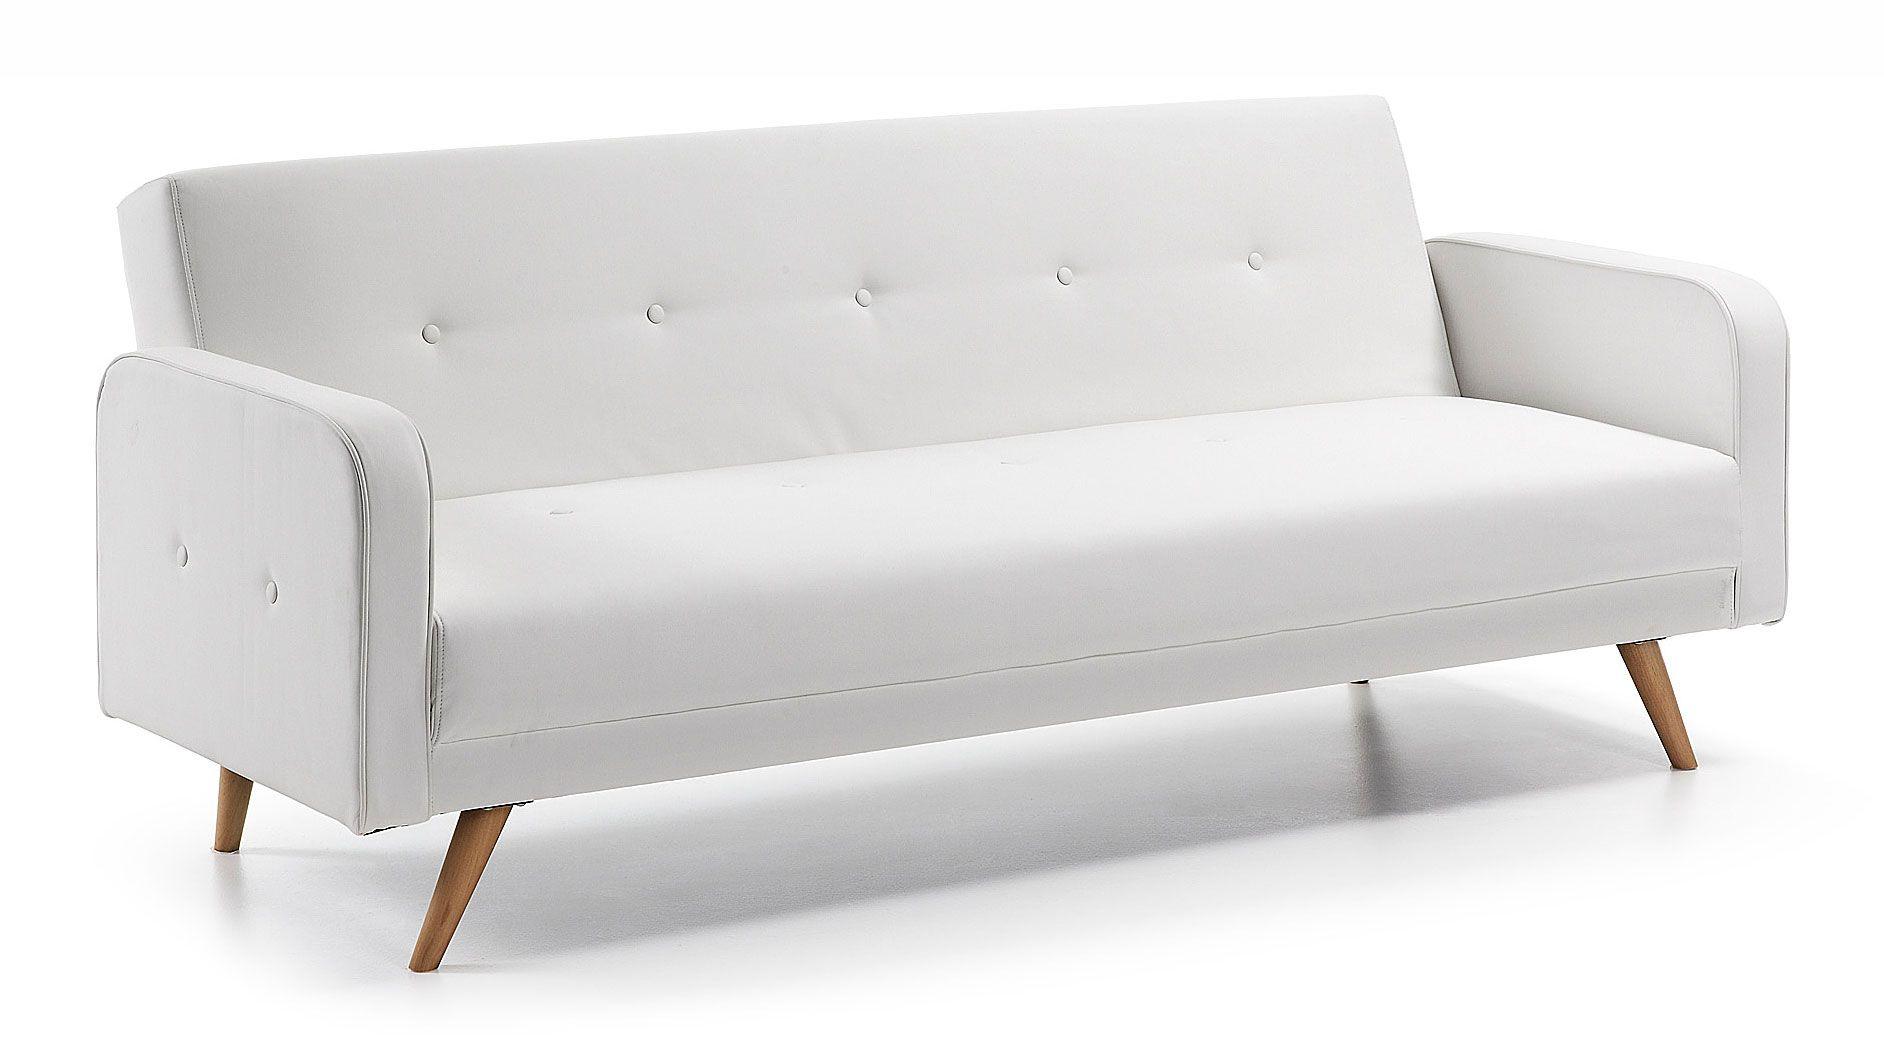 Sofá cama retro blanco Roger en Portobellostreet